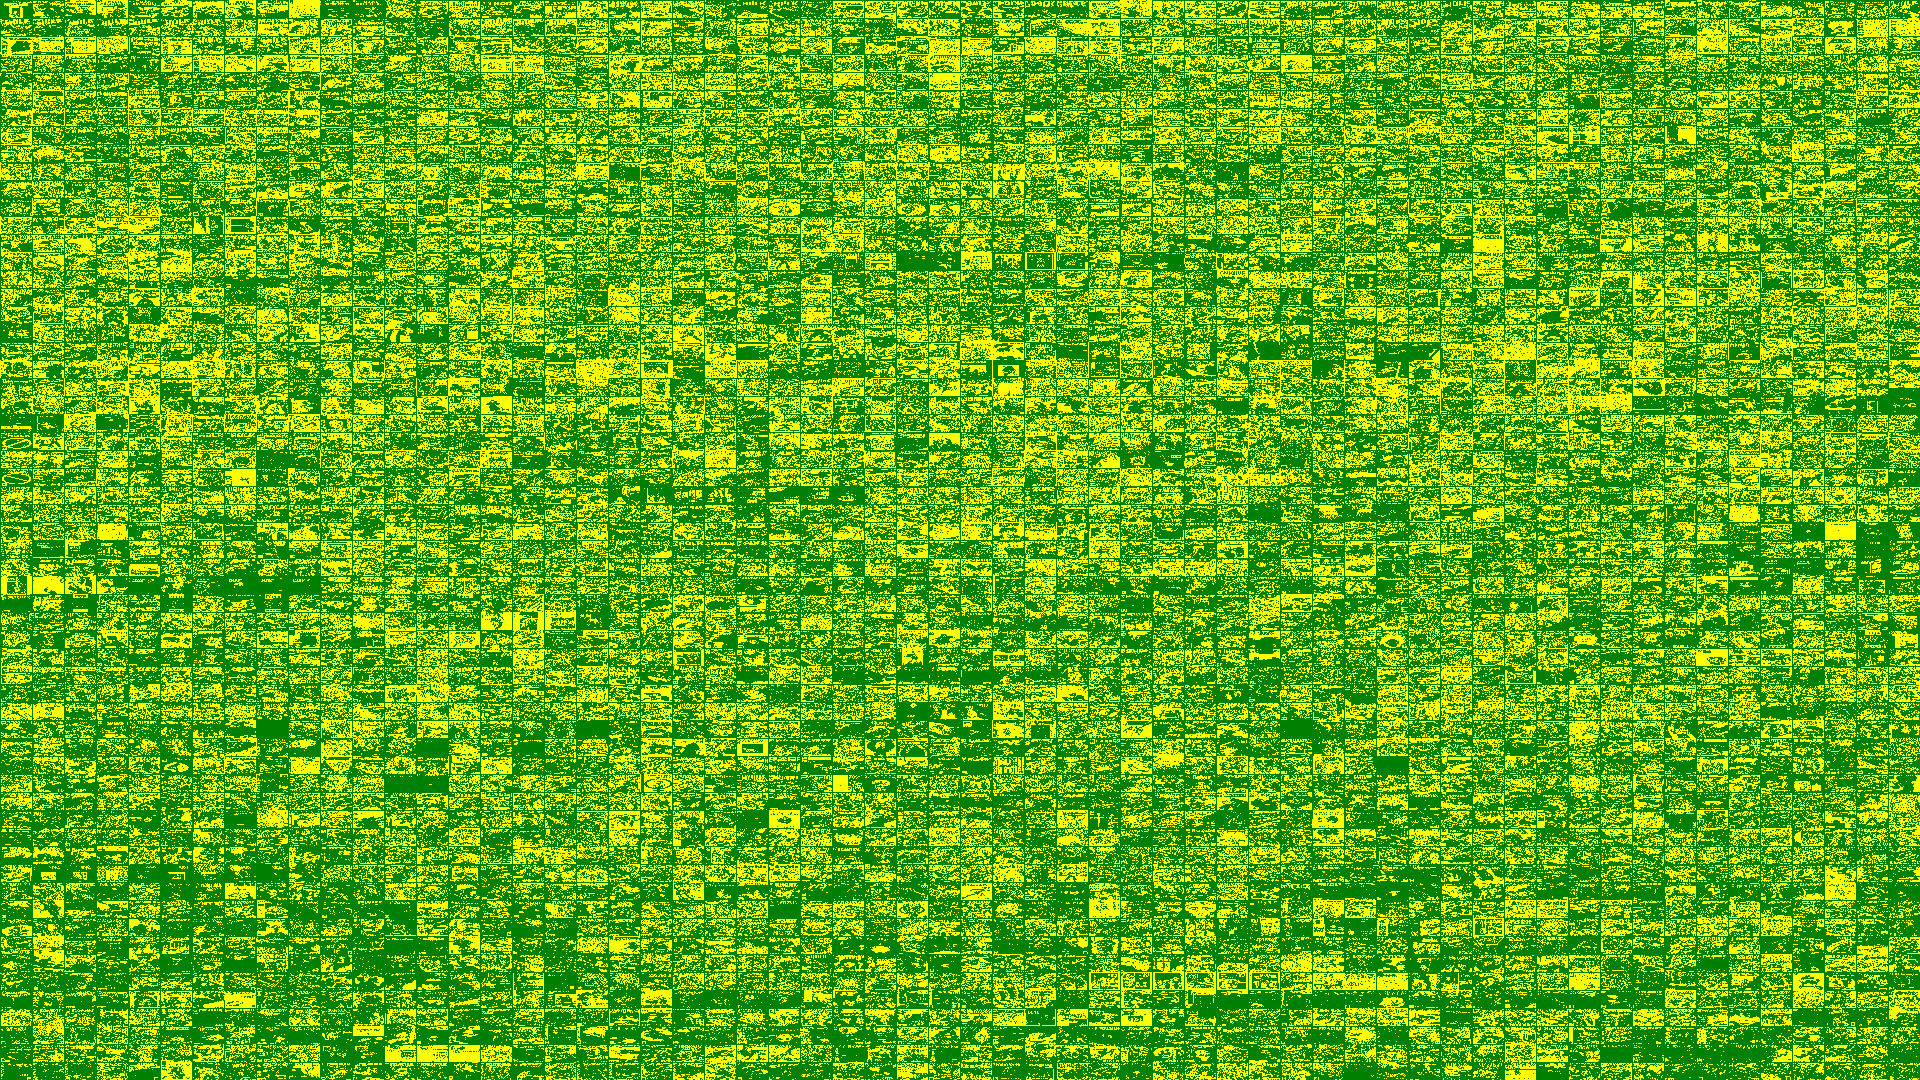 St Patricks Day HD Wallpaper | Wide Screen Wallpaper 1080p,2K,4K